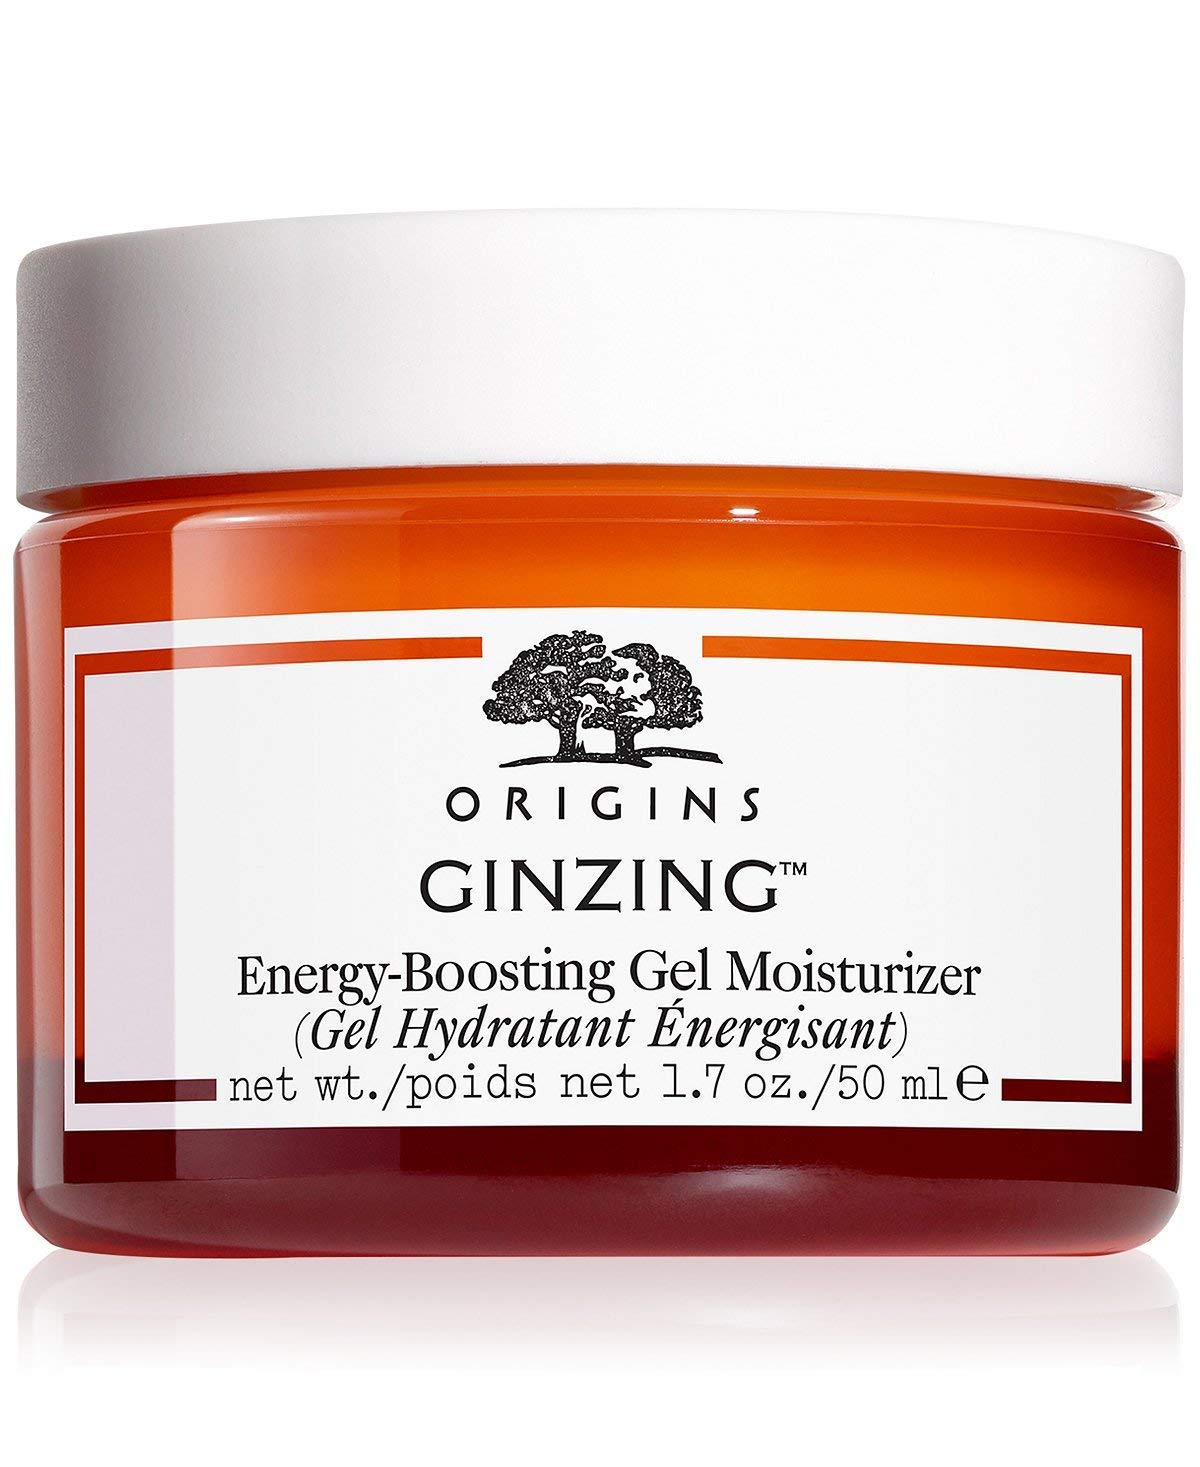 Origins Ginzing Energy Boosting Gel Moisturizer/Cream 1.7 ounce/50milliter Unbox by Origins